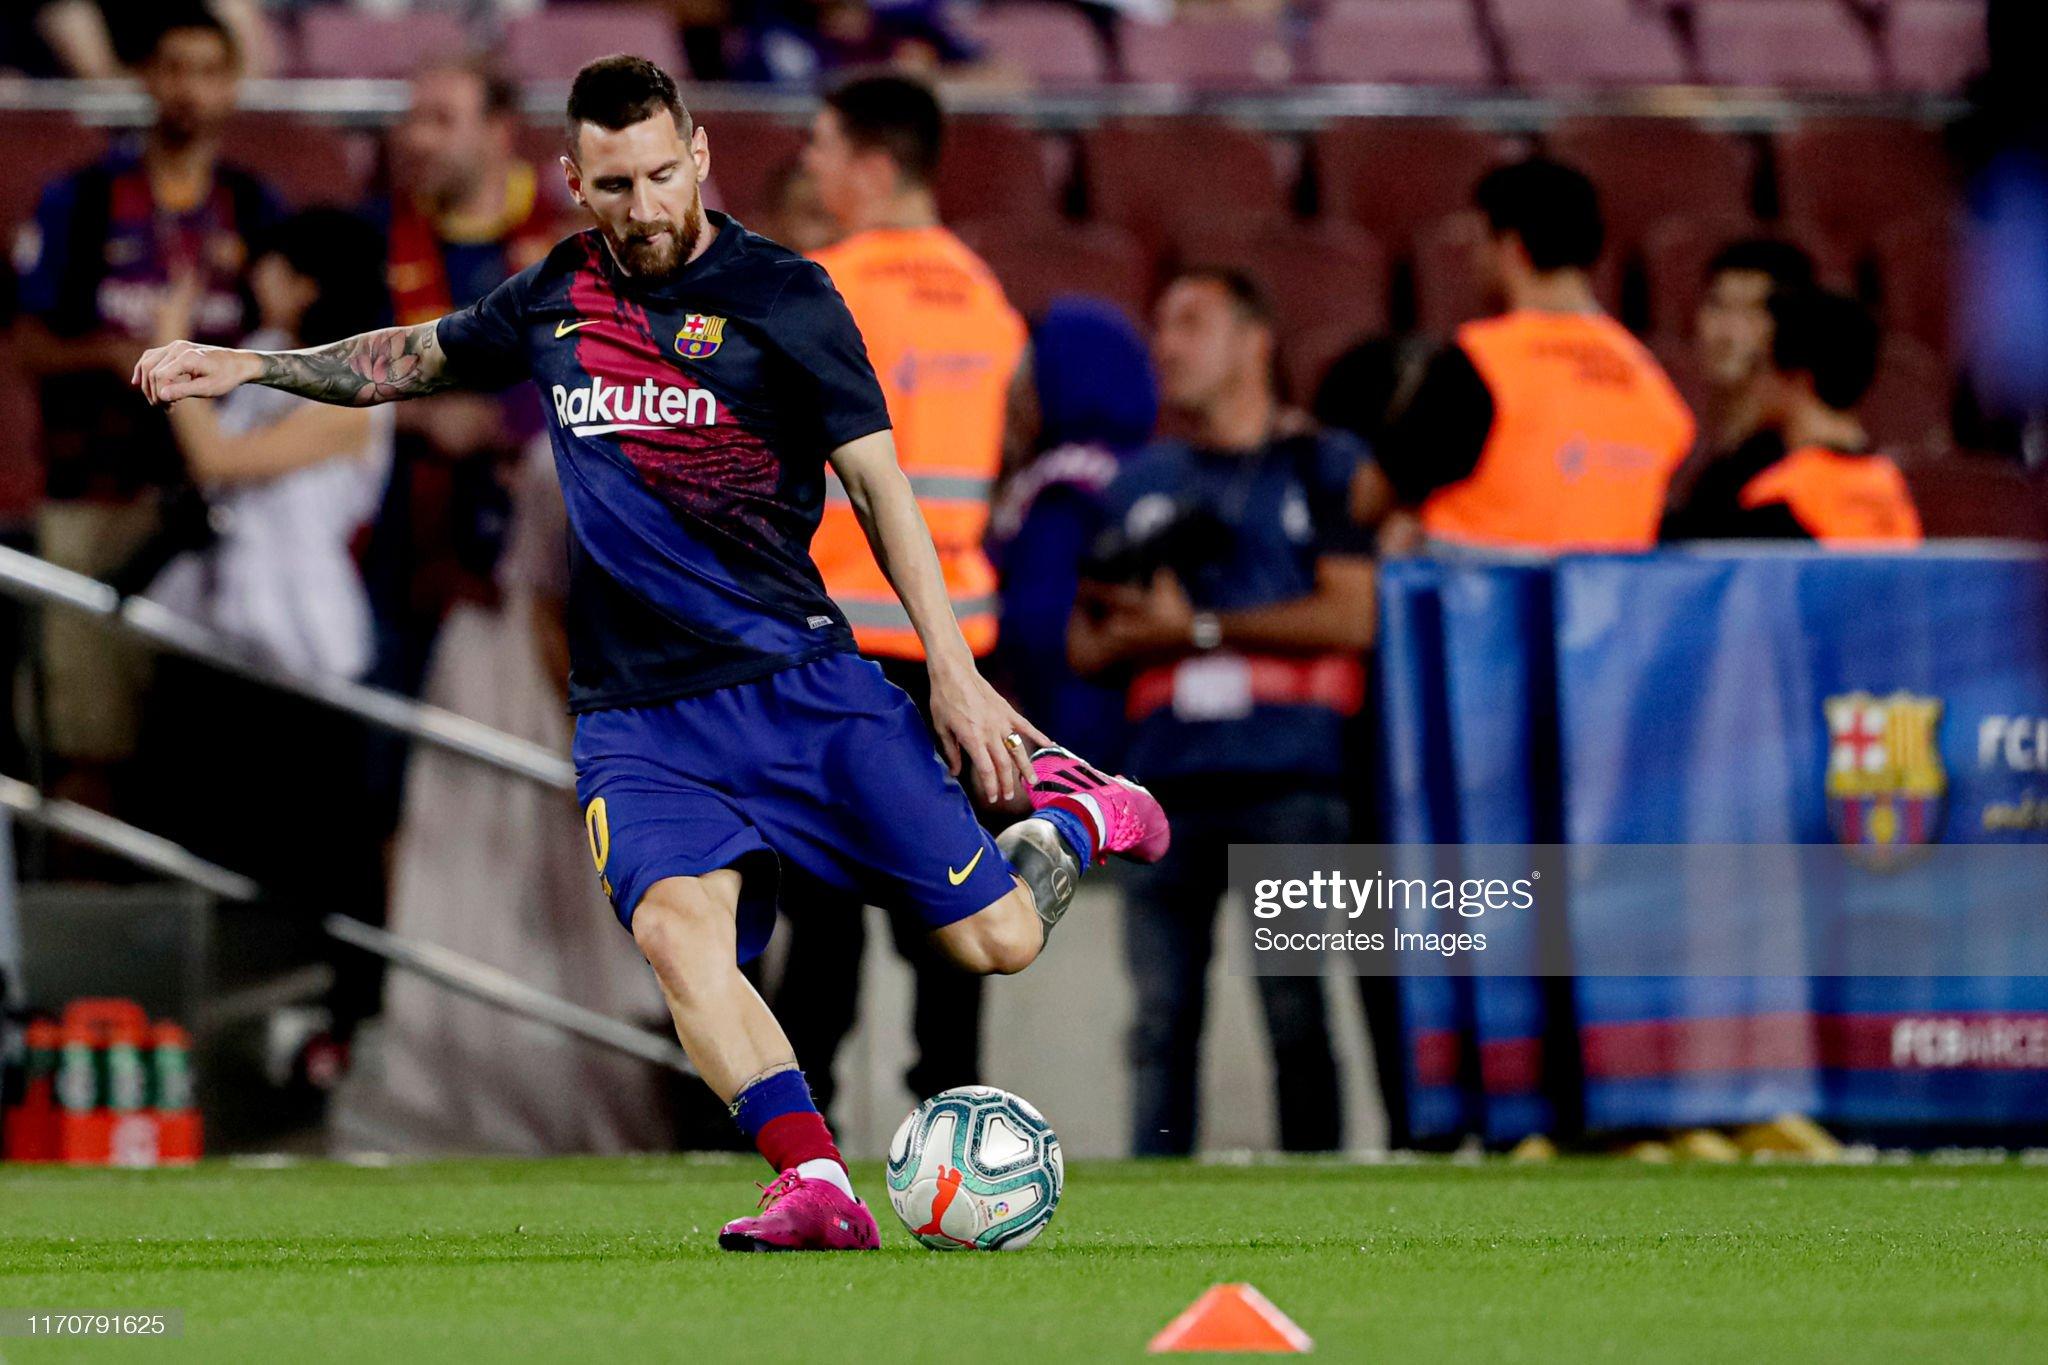 صور مباراة : برشلونة - فياريال 2-1 ( 24-09-2019 )  Lionel-messi-of-fc-barcelona-during-the-la-liga-santander-match-fc-picture-id1170791625?s=2048x2048